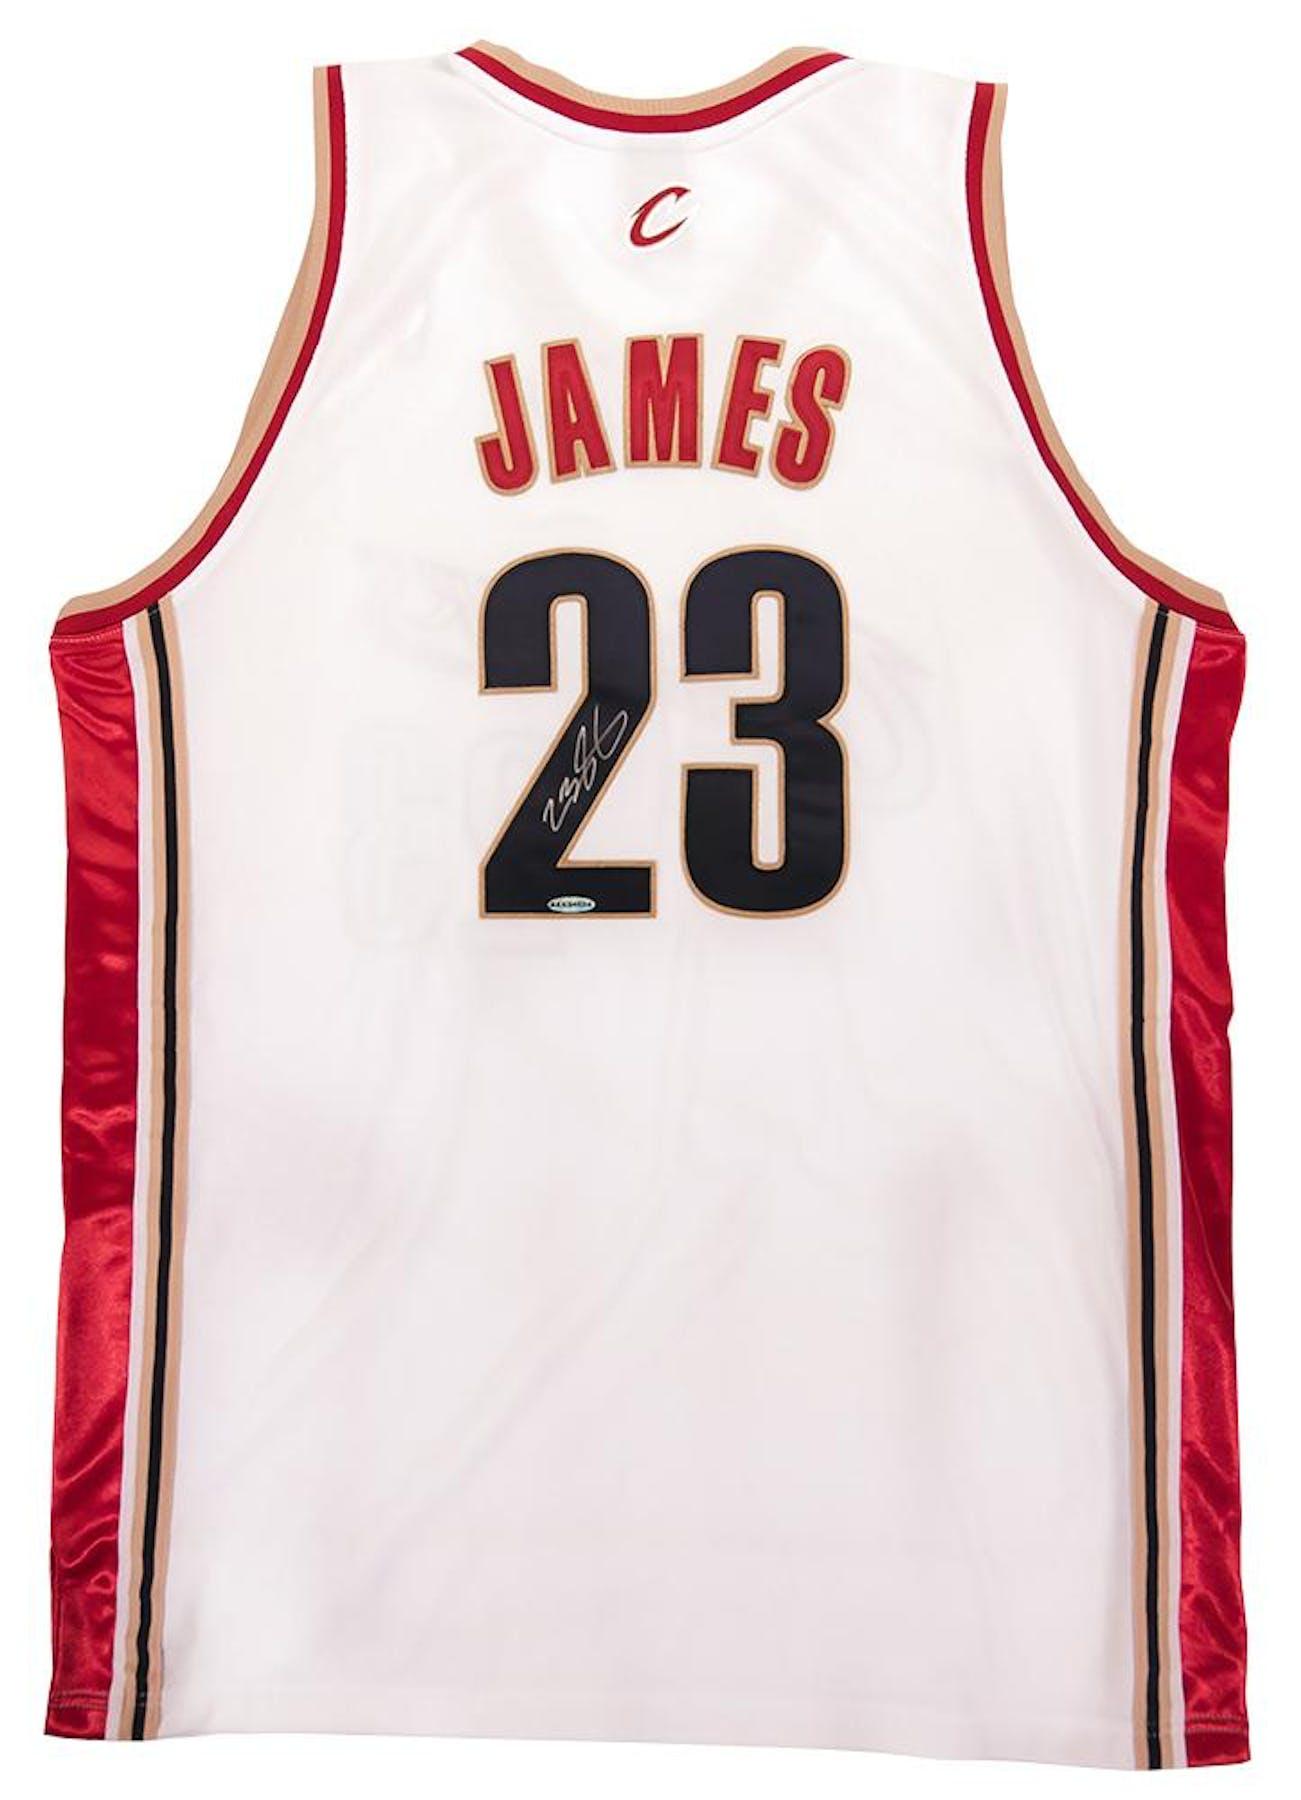 681f966b8 LeBron James Autographed Cleveland Cavaliers Authentic 2003 ...